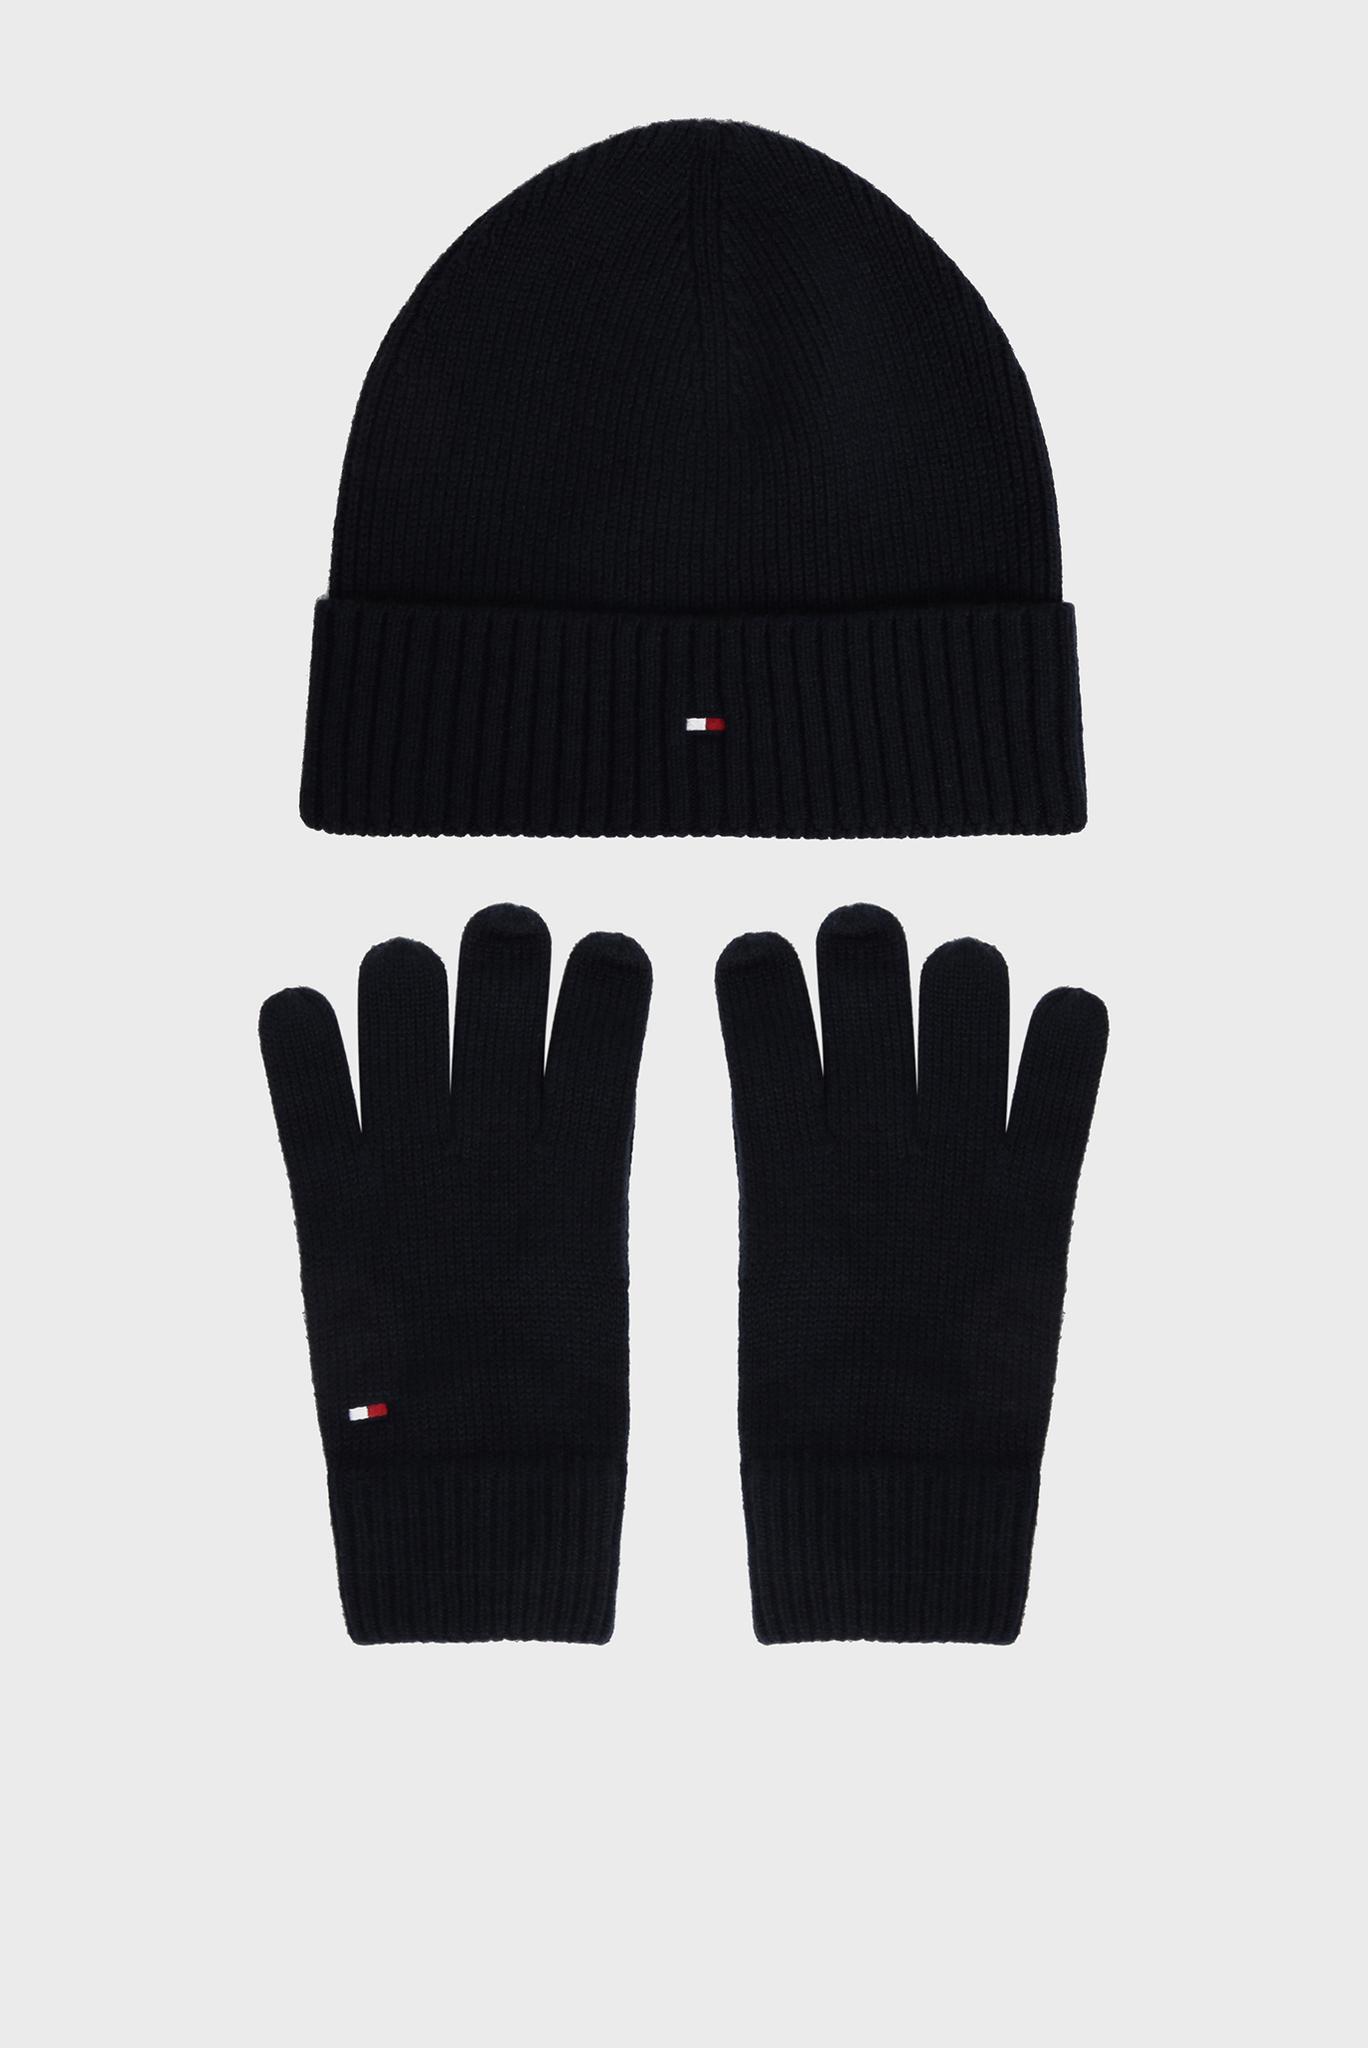 Мужской комплект аксессуаров (шапка, перчатки) PIMA COTTON Tommy Hilfiger